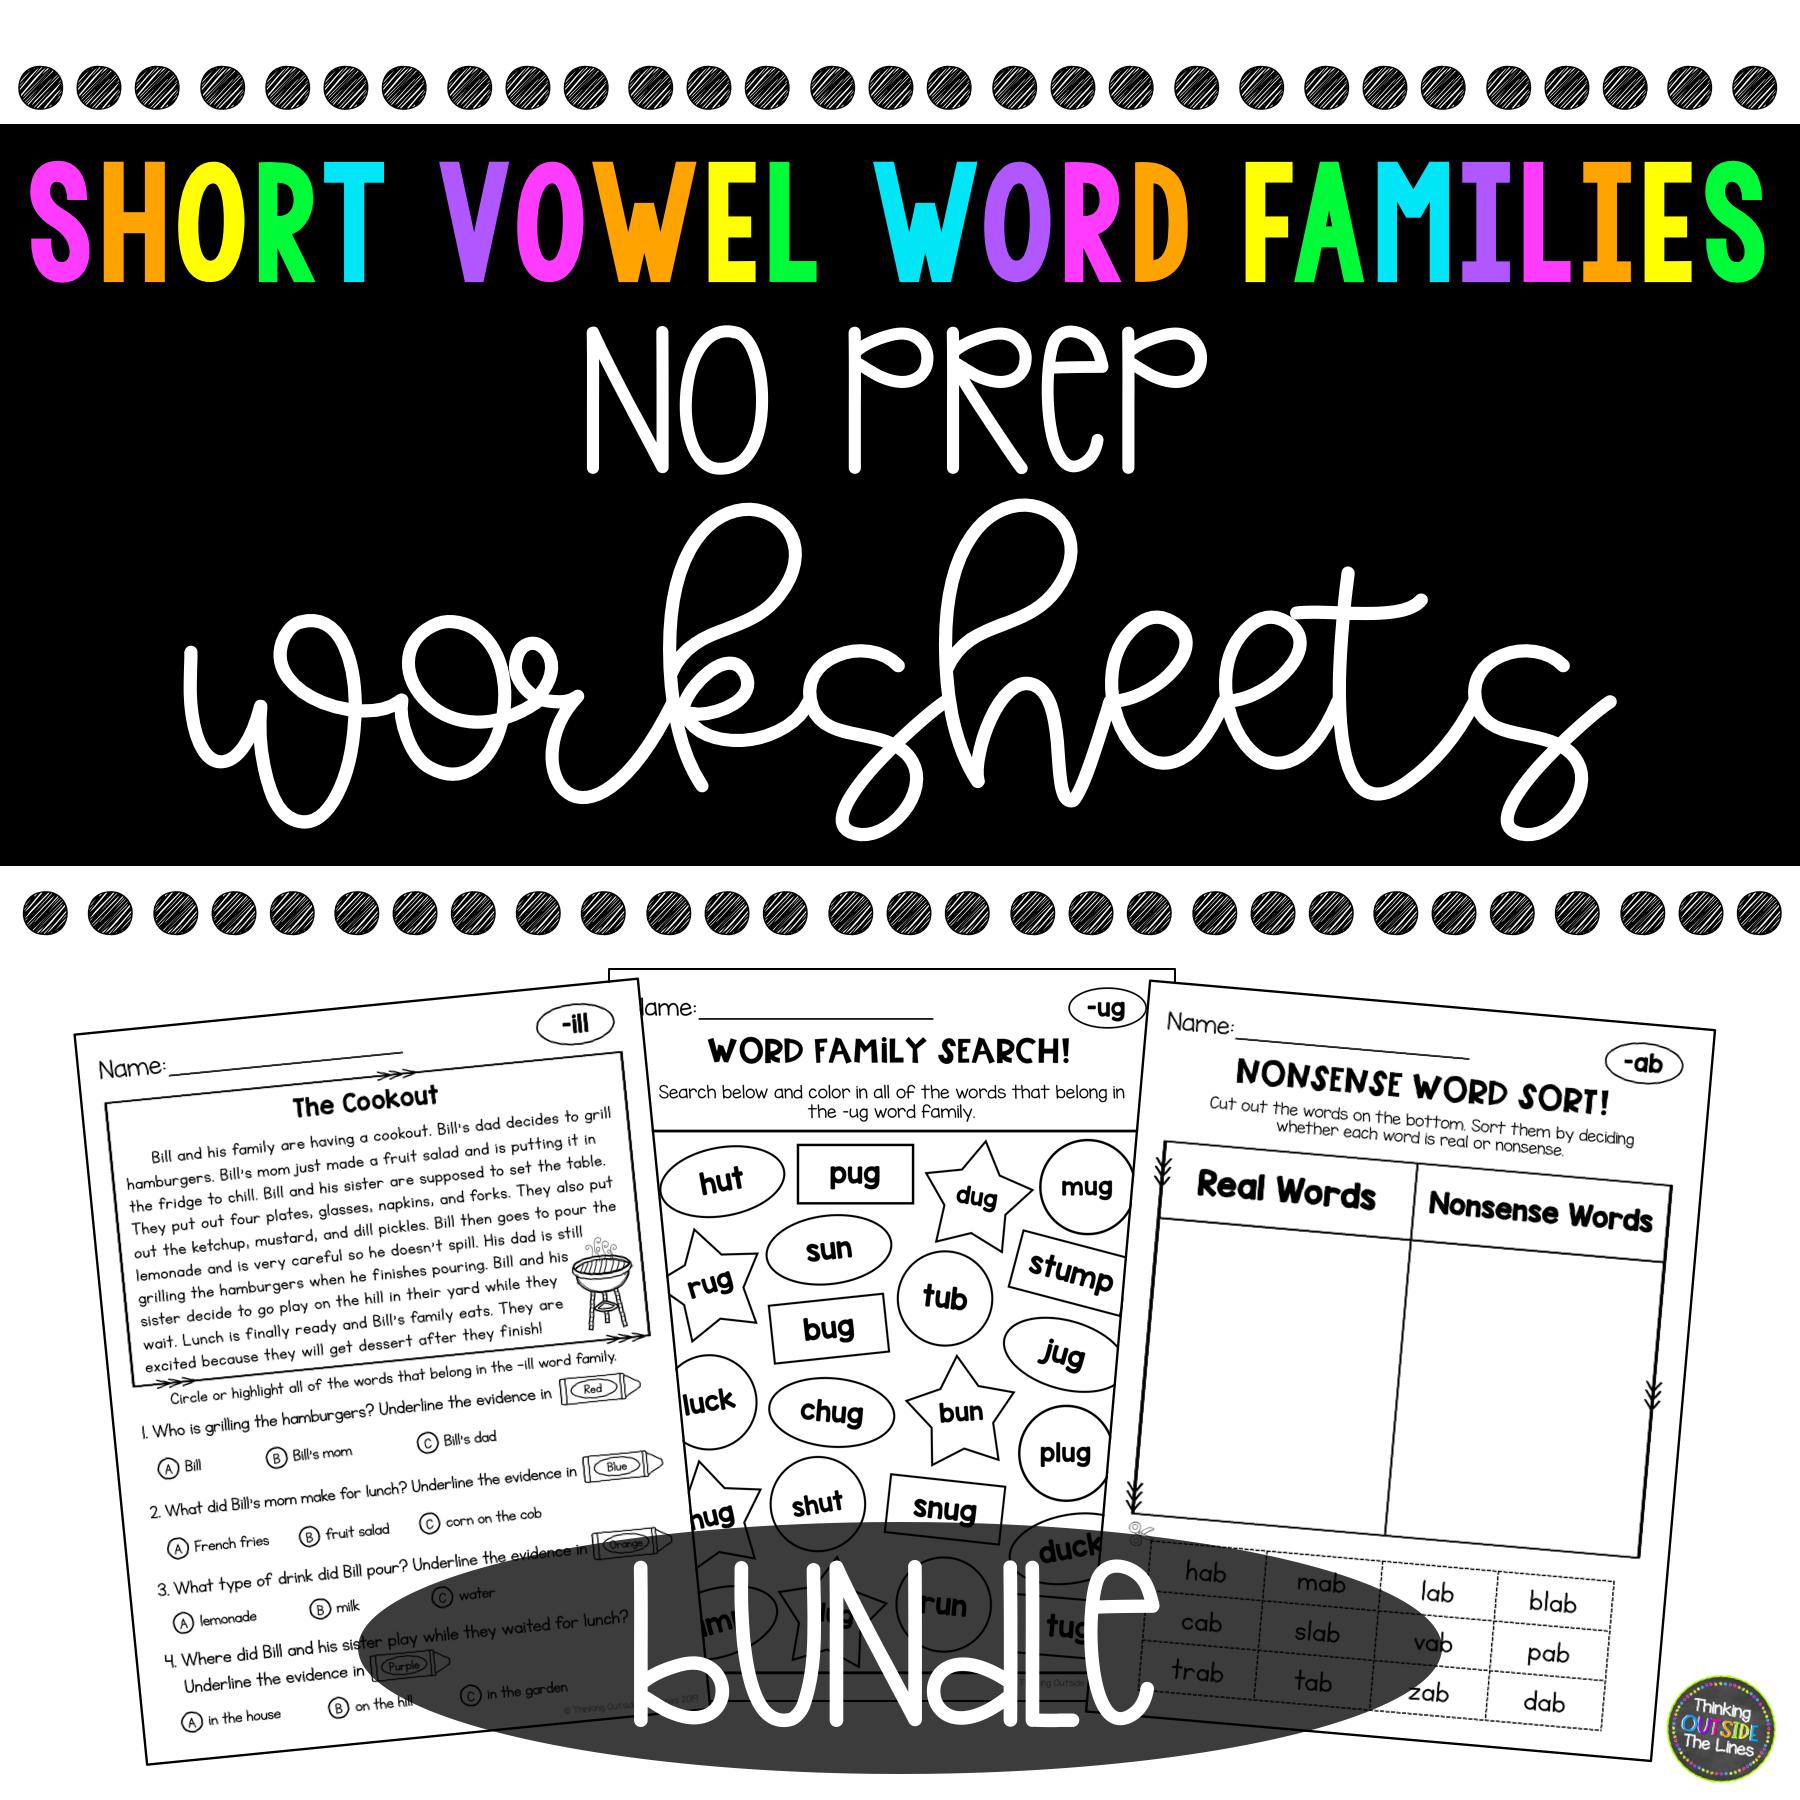 Short Vowel Word Family No Prep Worksheet Bundle